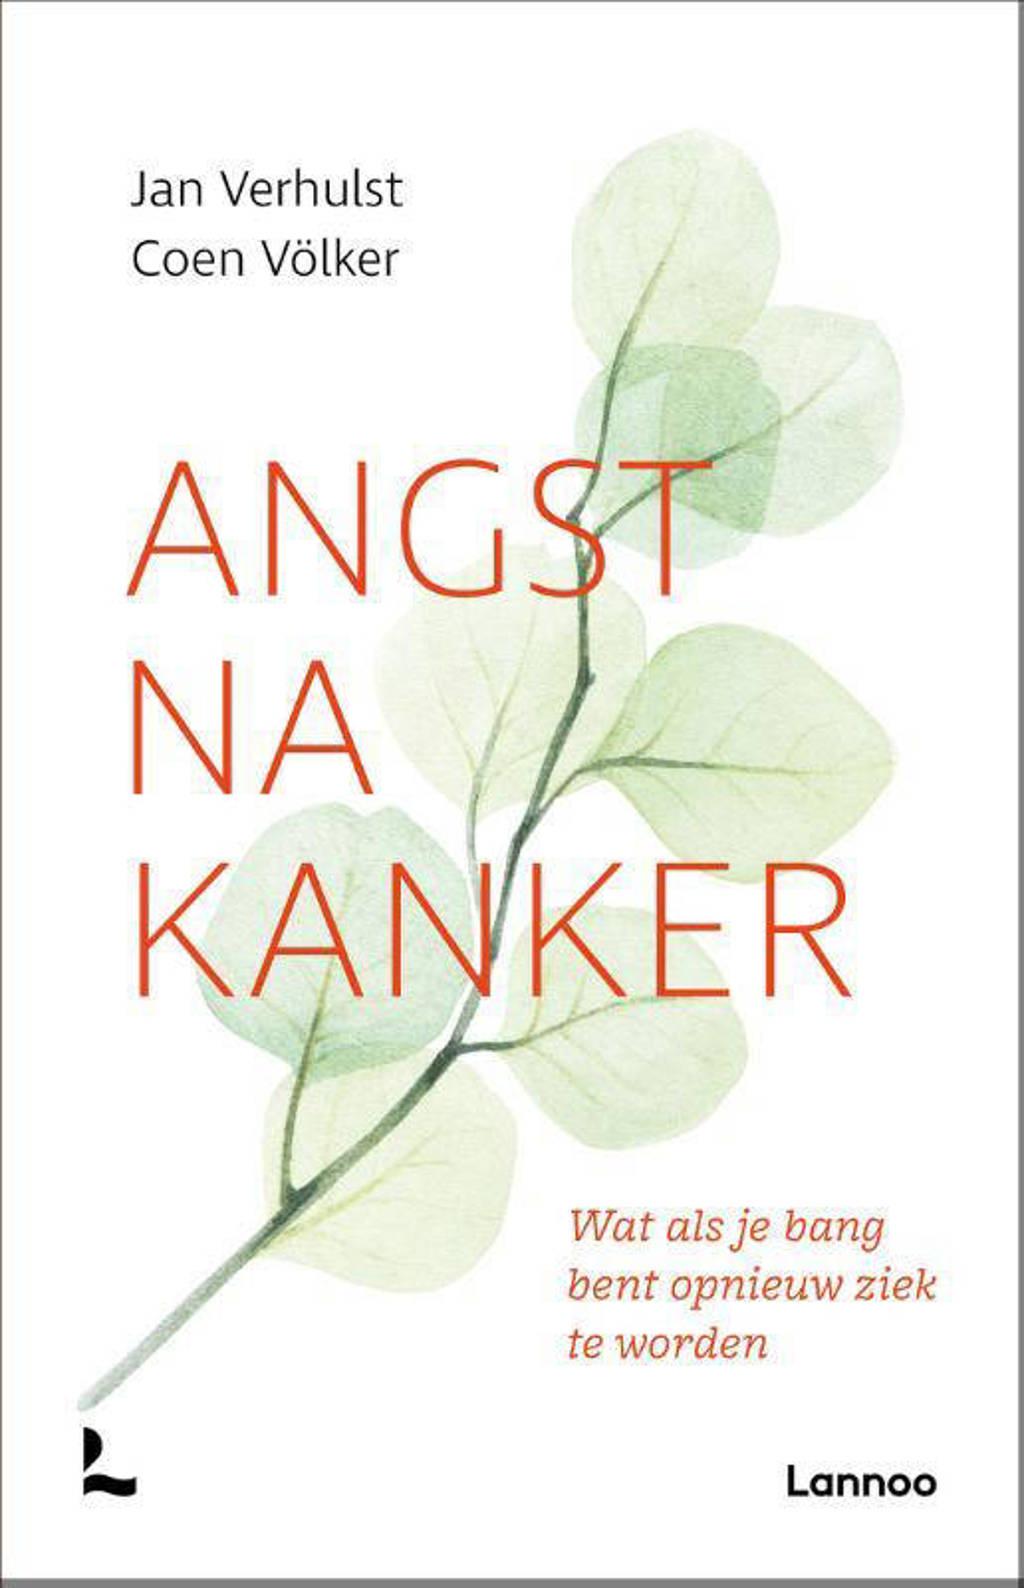 Angst na kanker - Jan Verhulst en Coen Völker